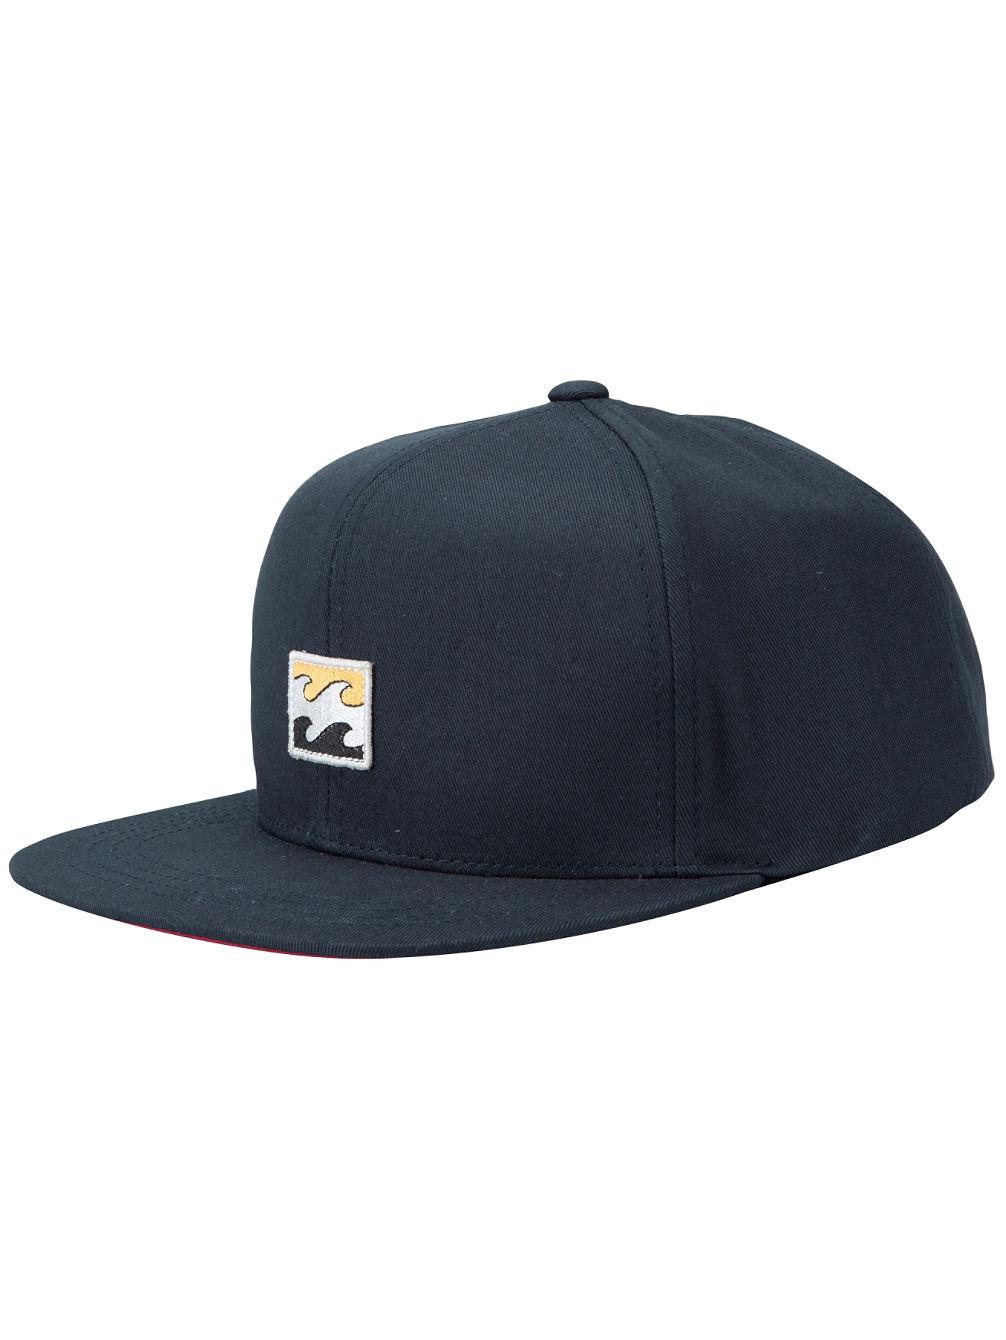 operative-snapback-cap